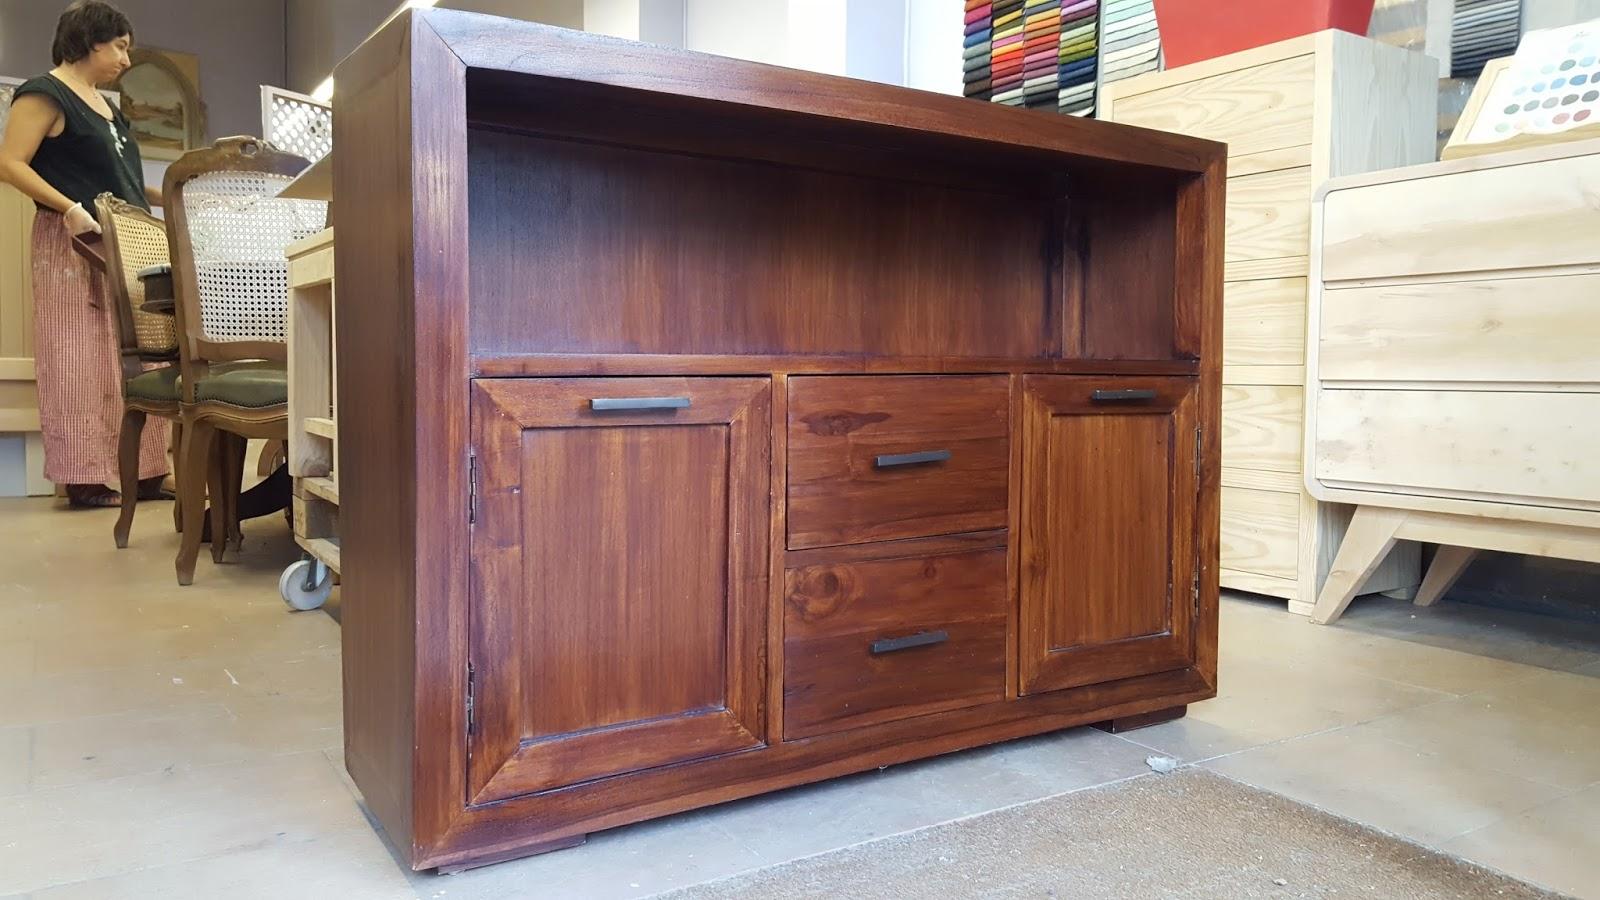 Mueble Teca Cool Muebles De Madera Teca Rack Mueble Para  # Muebles Teca Interior